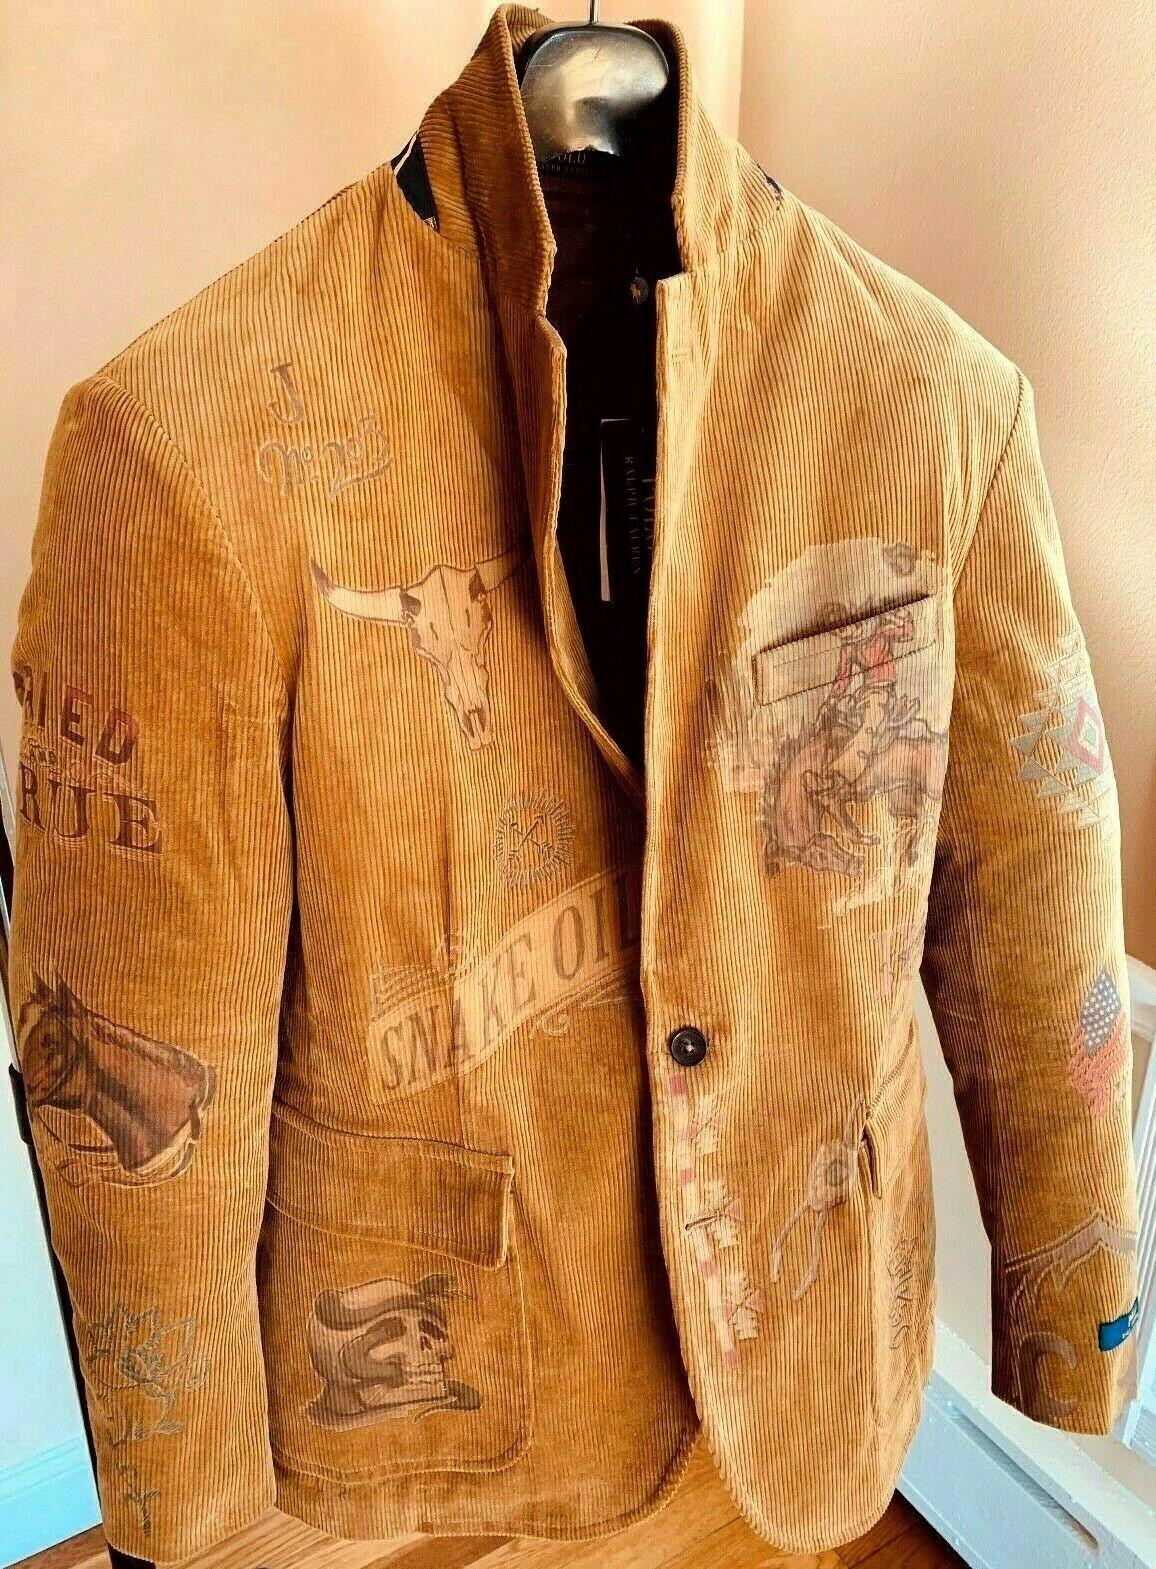 Polo Ralph Lauren Rodeo Western Colorado Cowboy Artwork Jacket Sport Coat Blazer Ebay Ralph Lauren Leather Jacket Menswear Polo Ralph Lauren Mens [ 1569 x 1156 Pixel ]